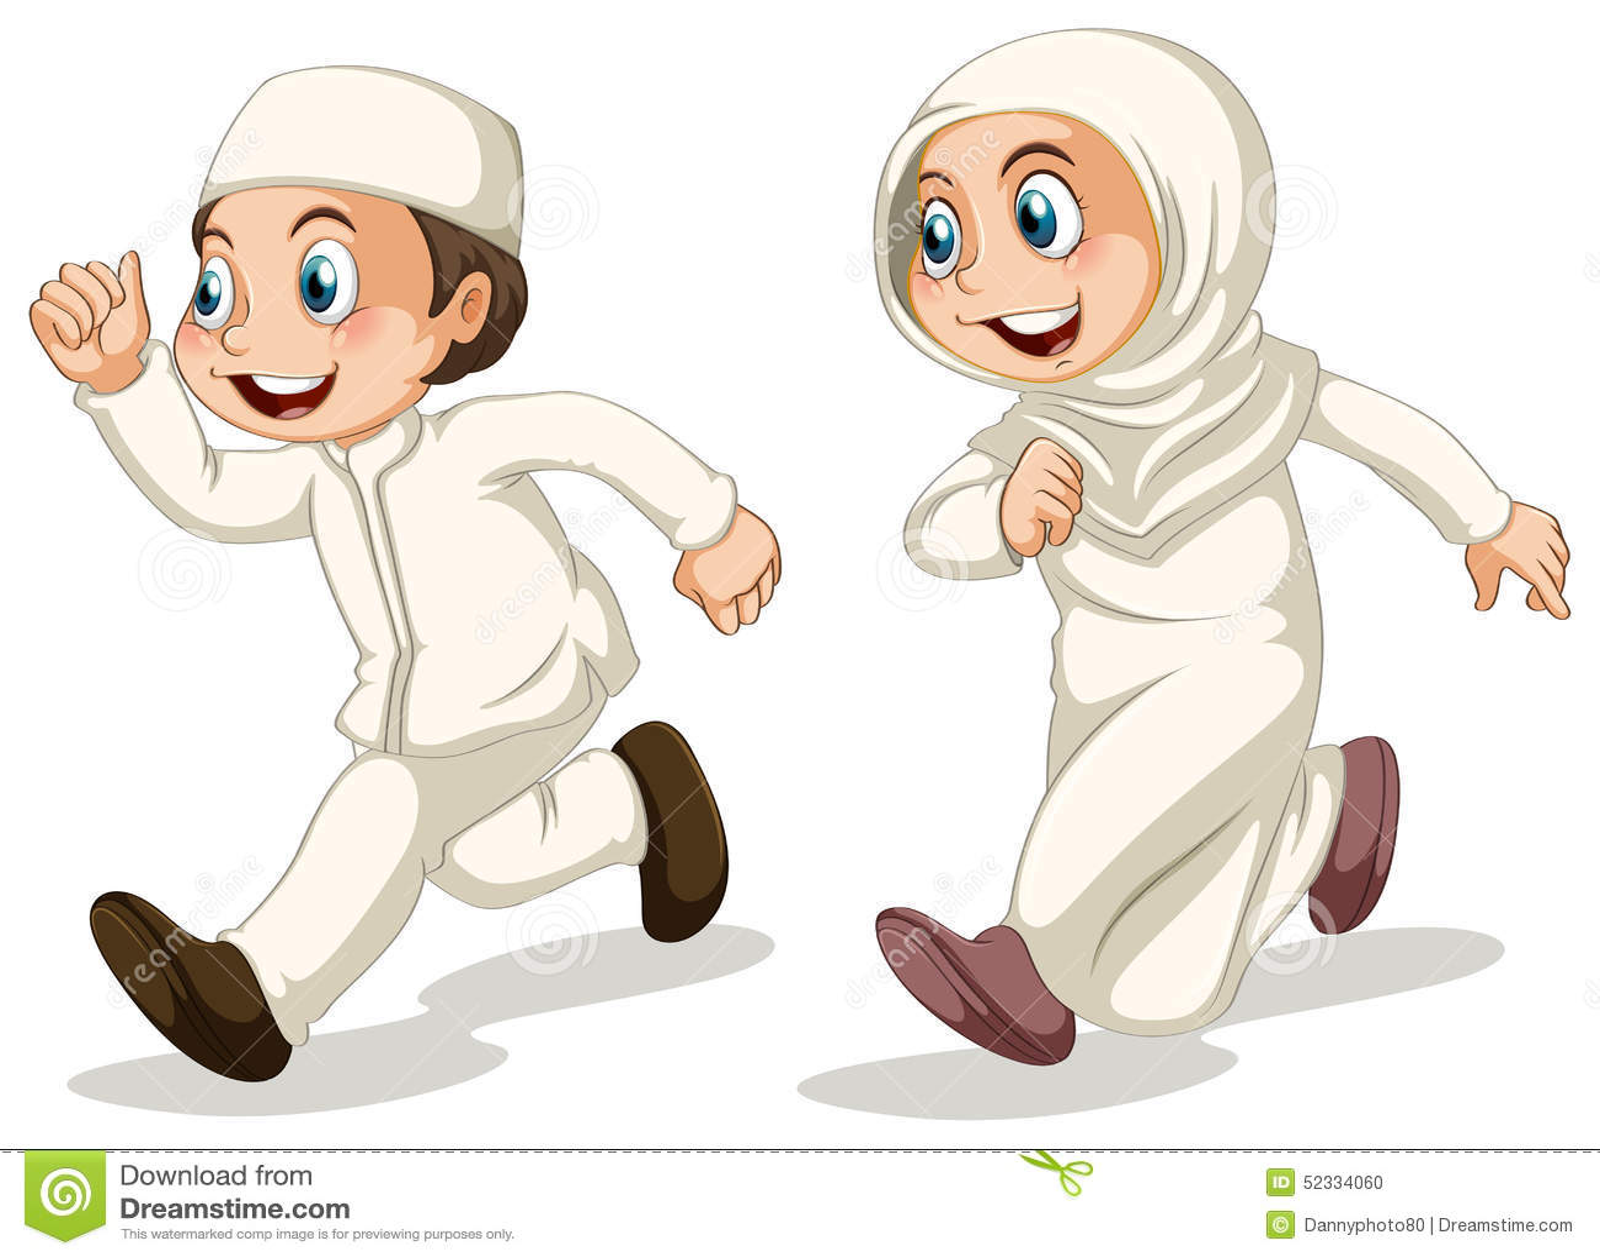 hight resolution of muslim boy and girl running